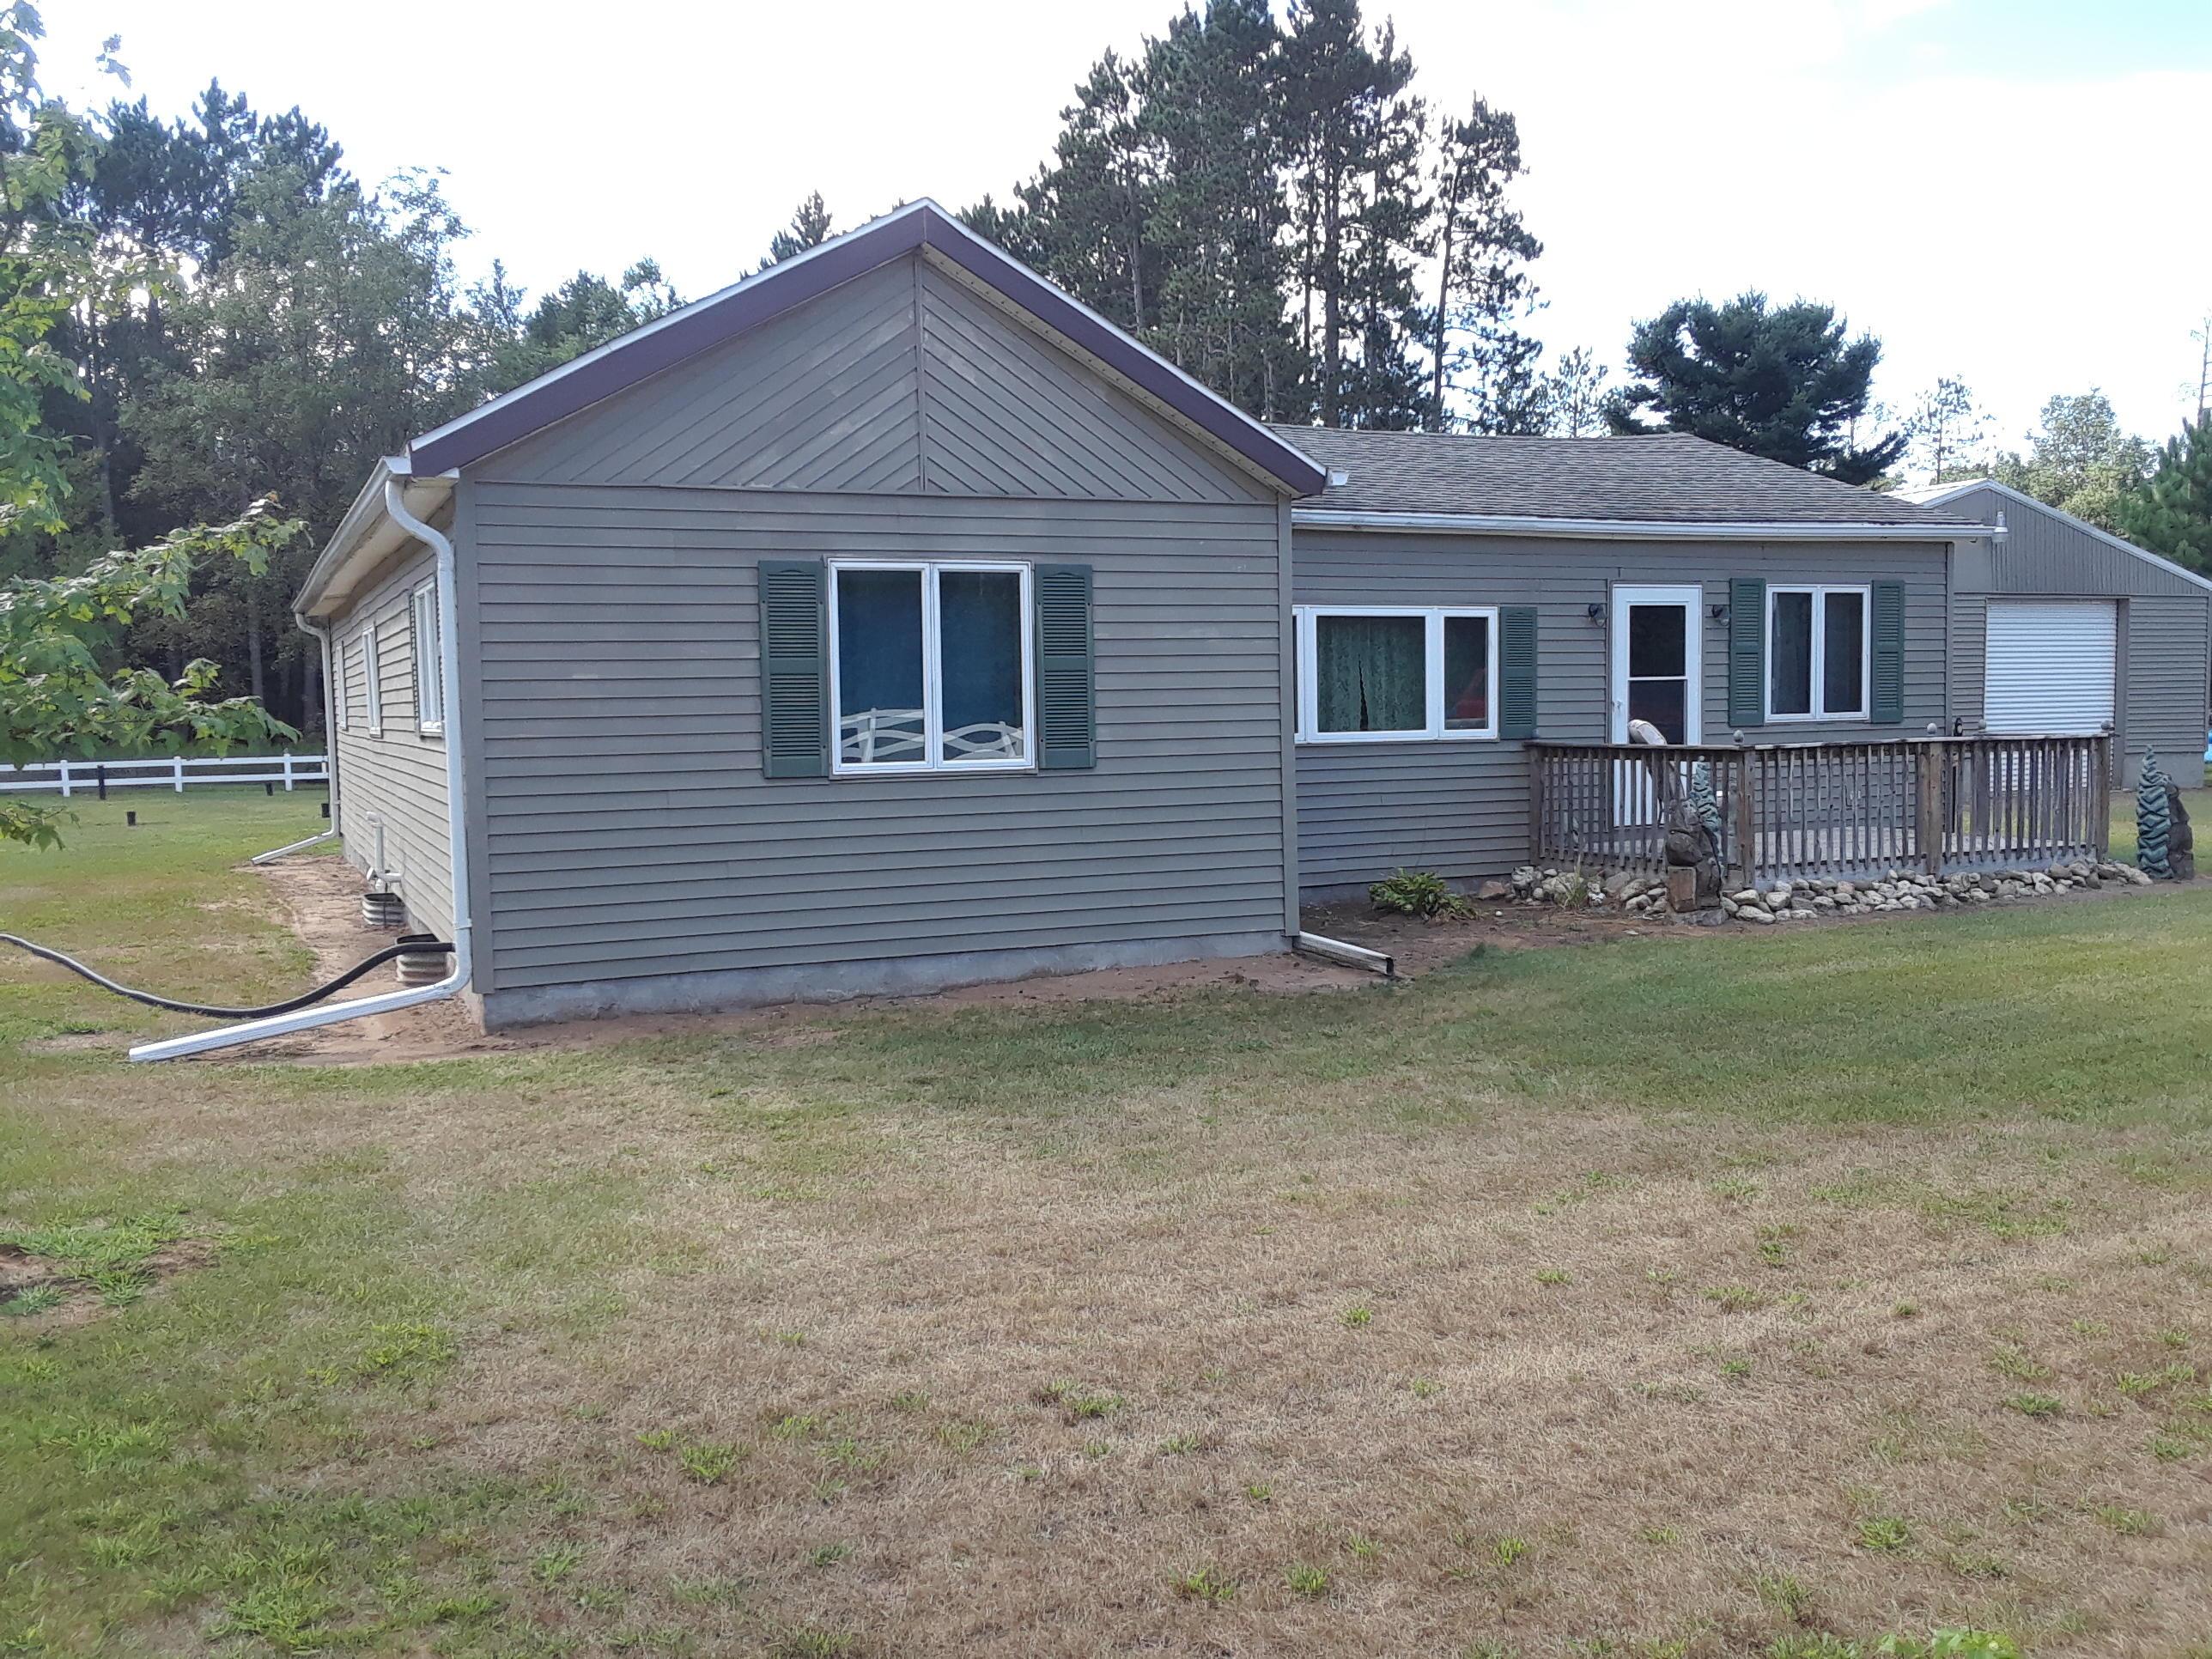 10111 Peshtigo Brook Rd, Breed, Wisconsin 54174, 3 Bedrooms Bedrooms, ,1 BathroomBathrooms,Single-family,For Sale,Peshtigo Brook Rd,1721401